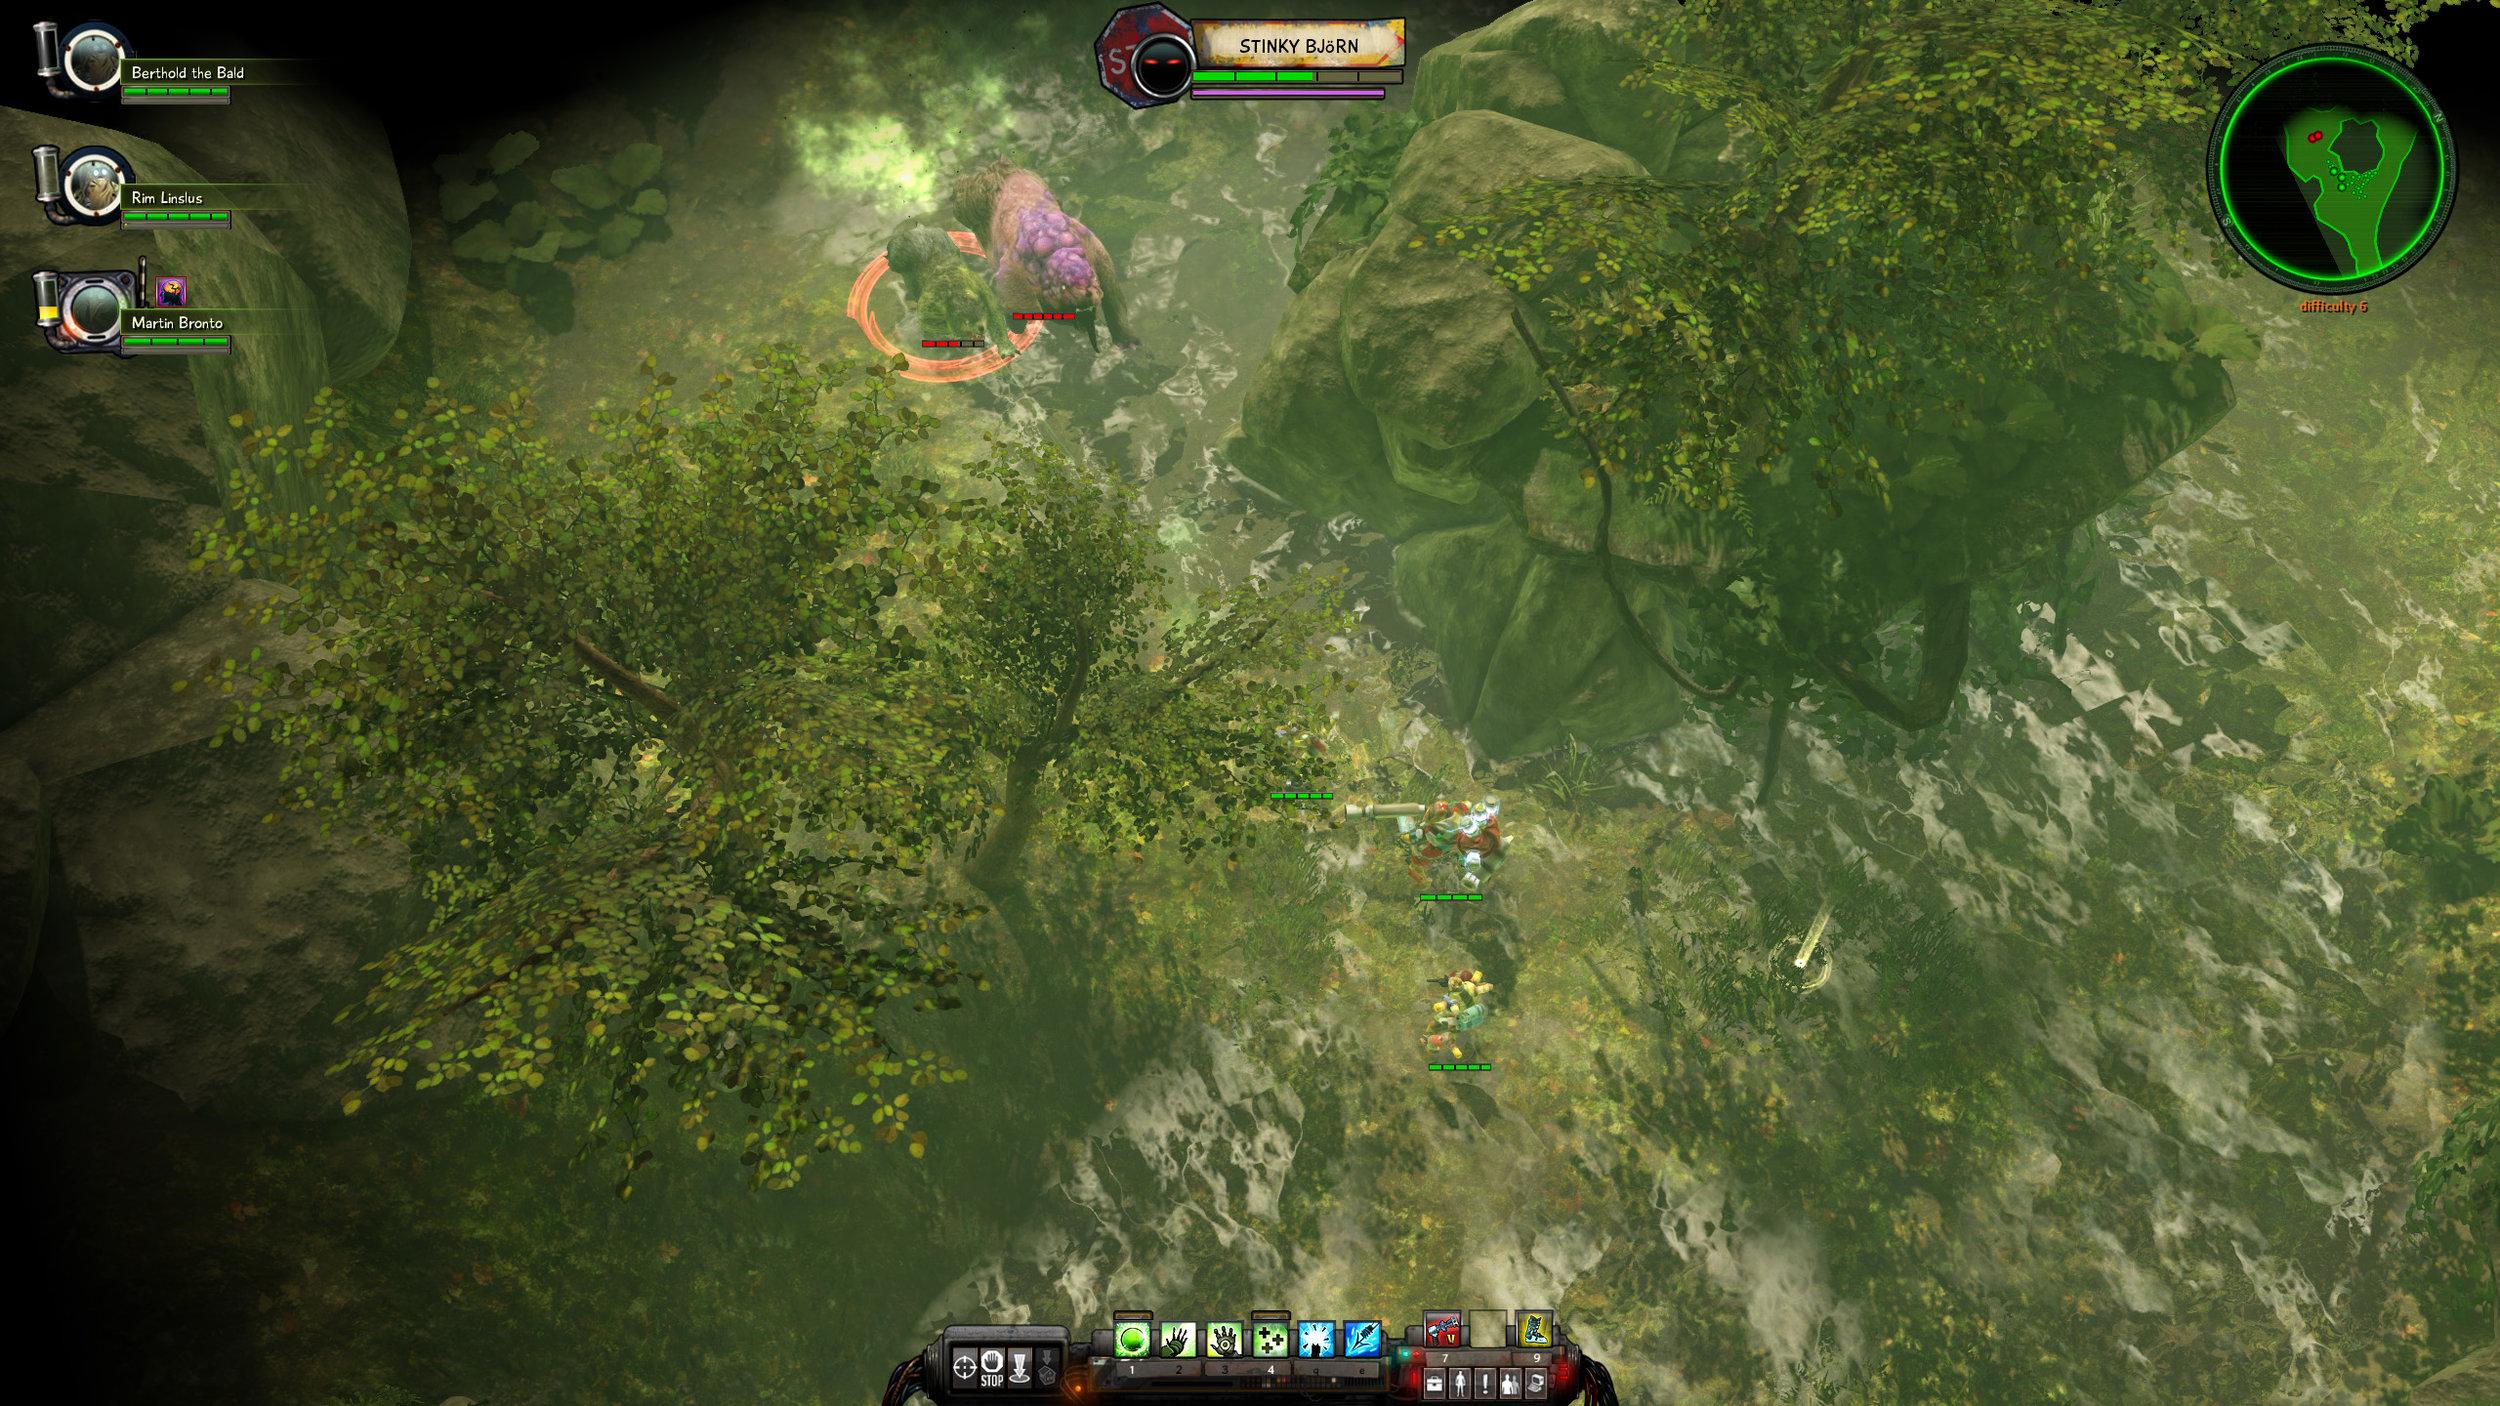 Krater Shadows over Solside Screenshot 17.jpg